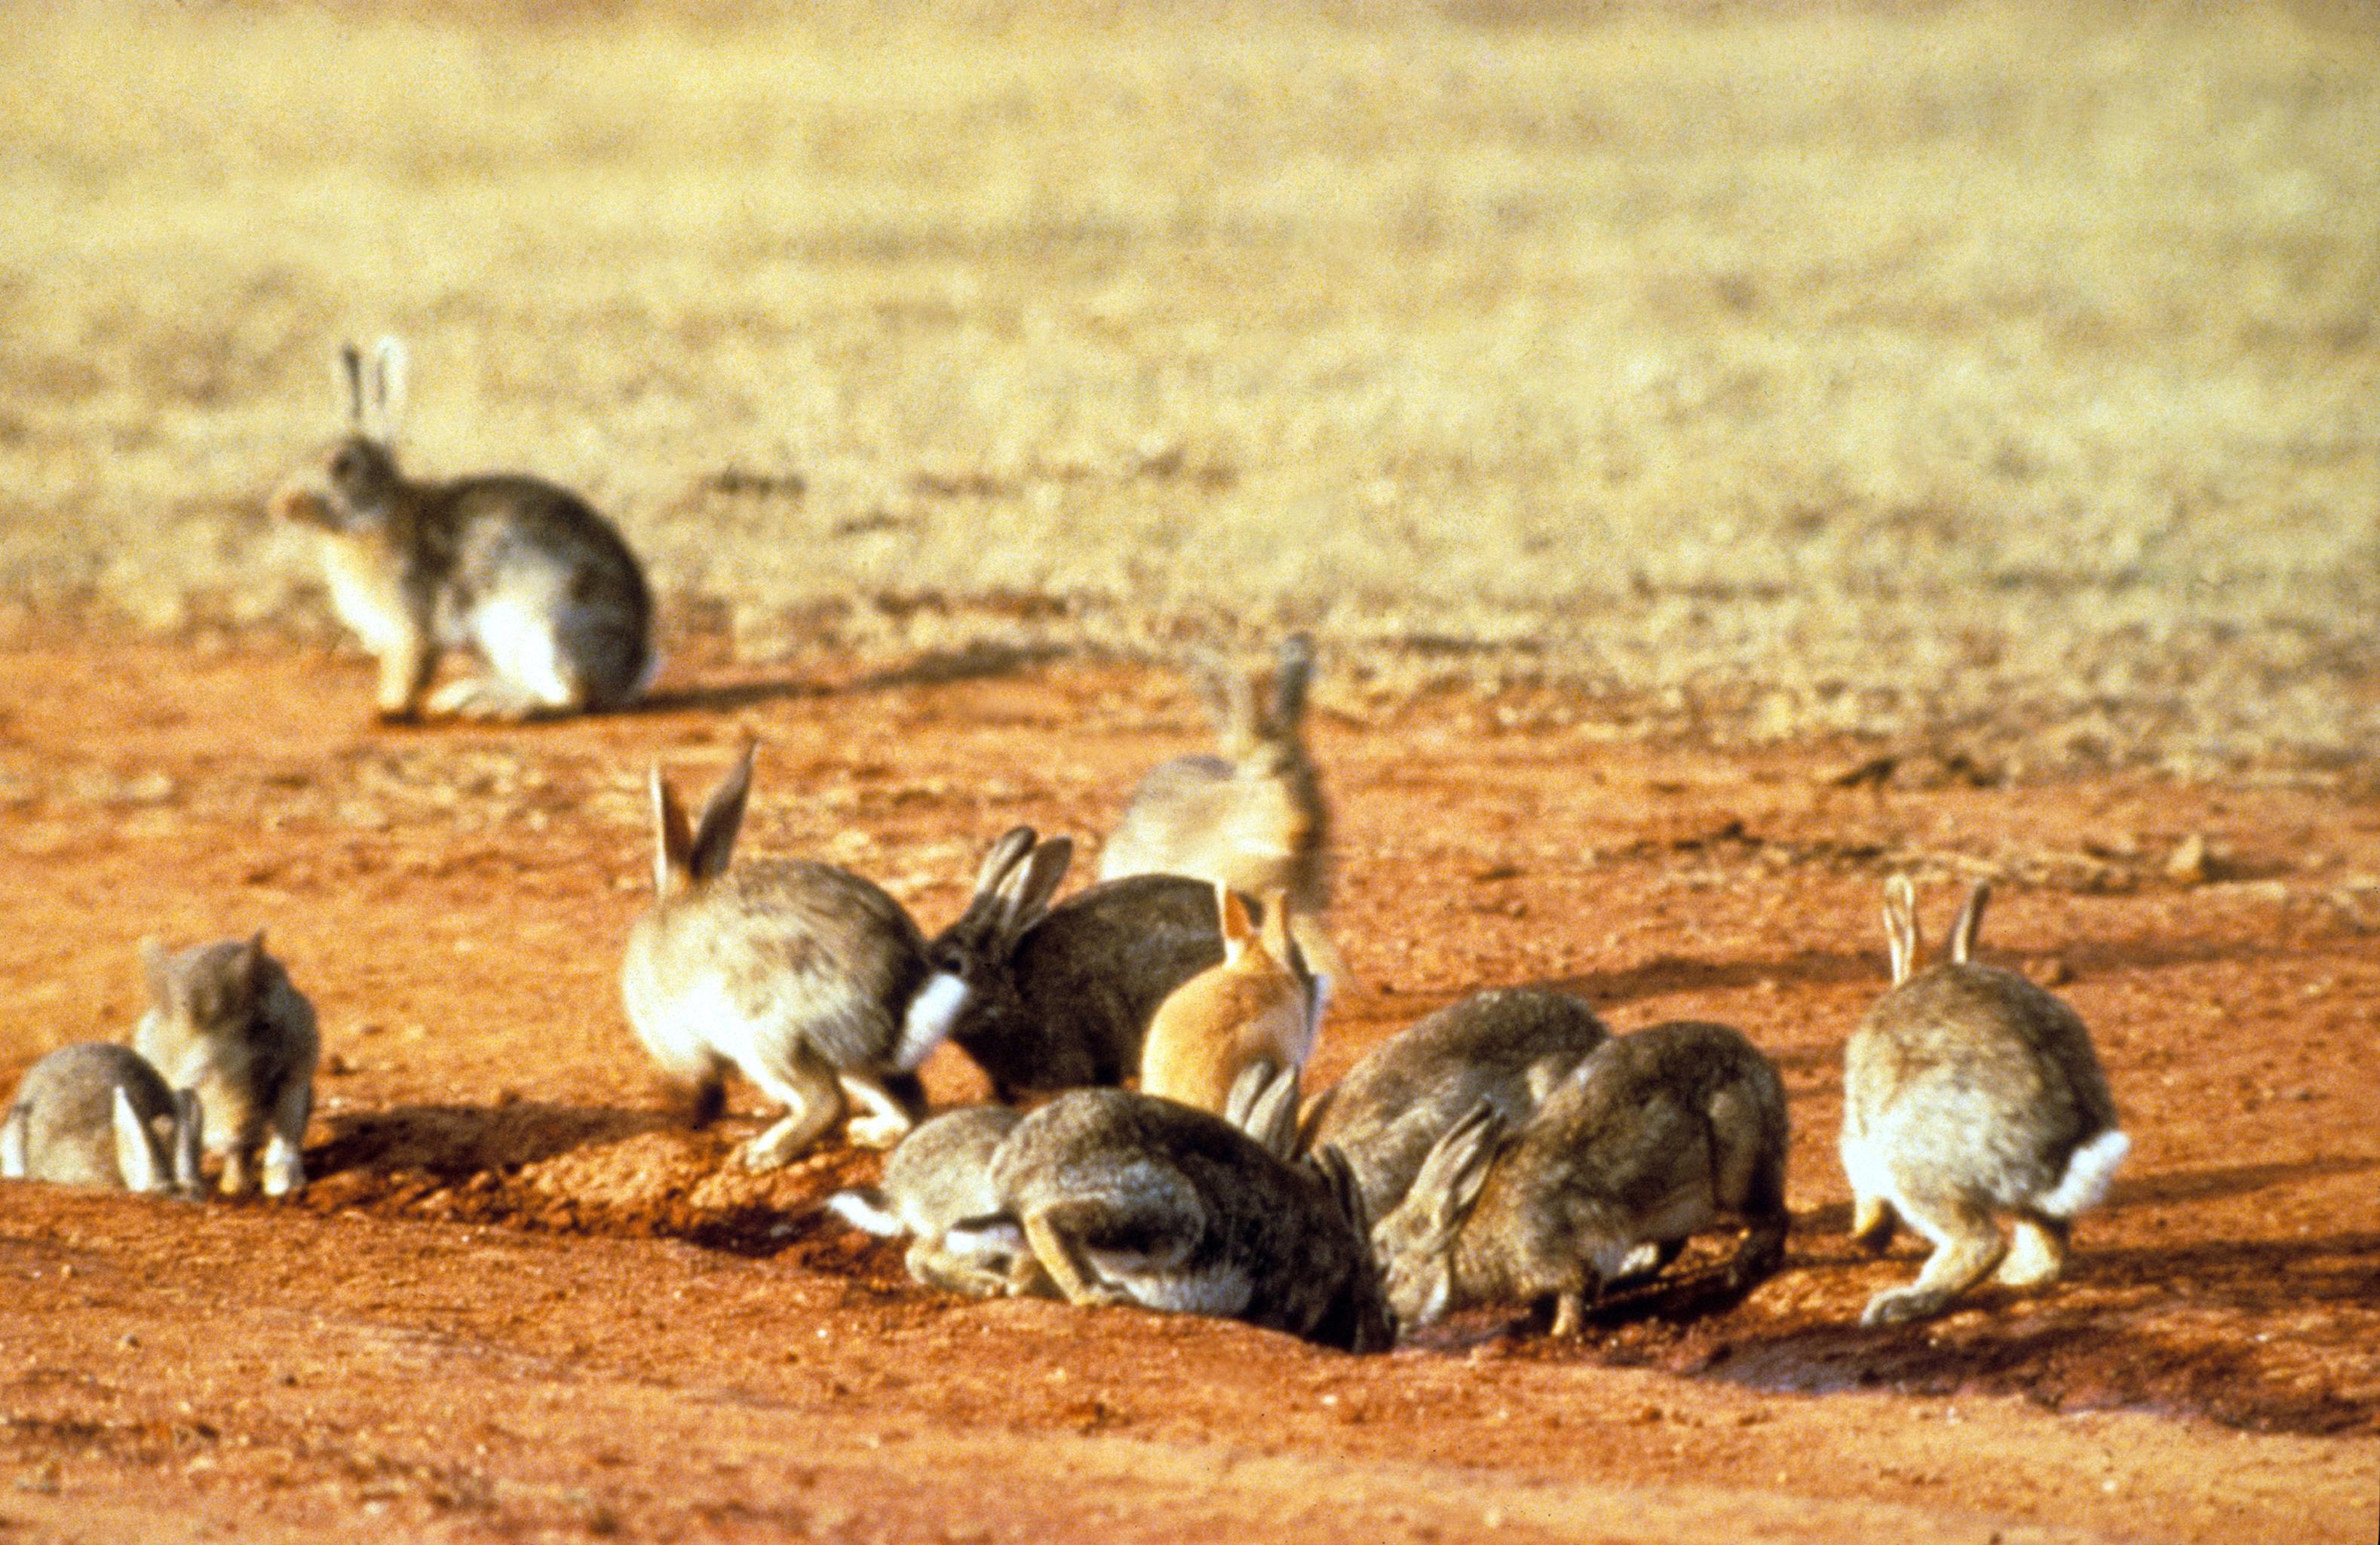 File:CSIRO ScienceImage 453 European Rabbits.jpg - Wikimedia Commons